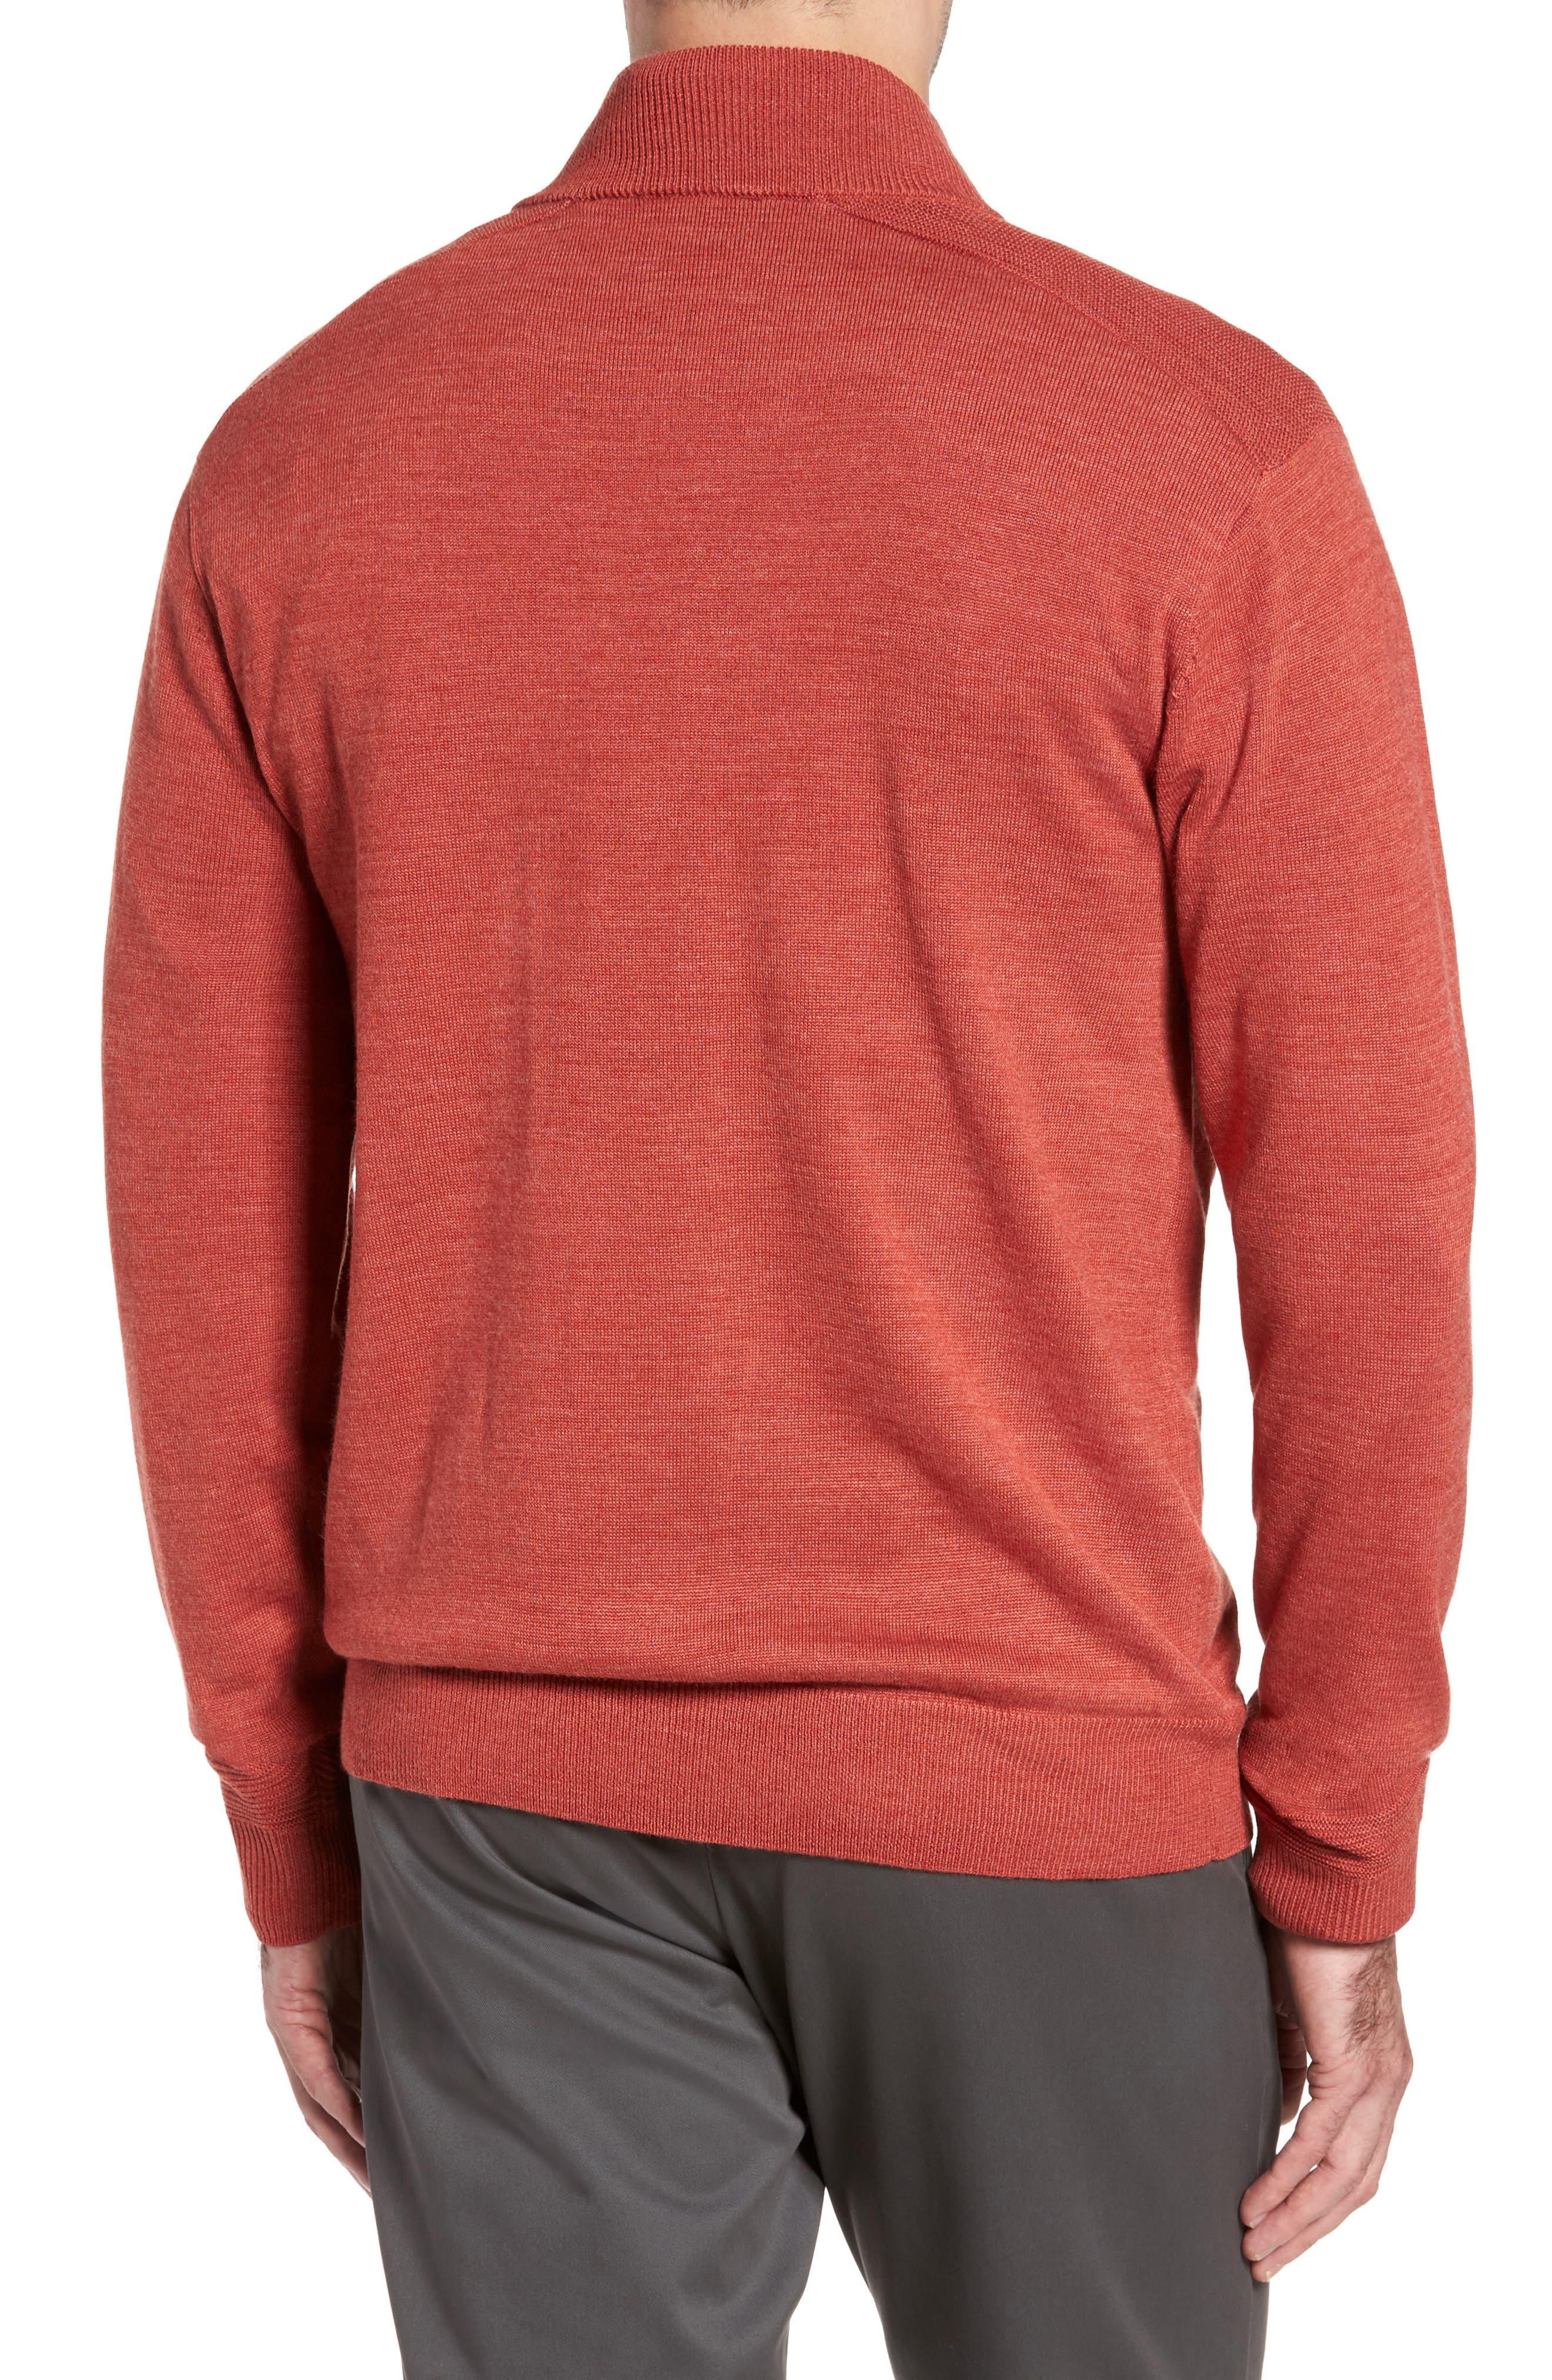 Douglas Quarter Zip Wool Blend Sweater,                             Alternate thumbnail 2, color,                             600